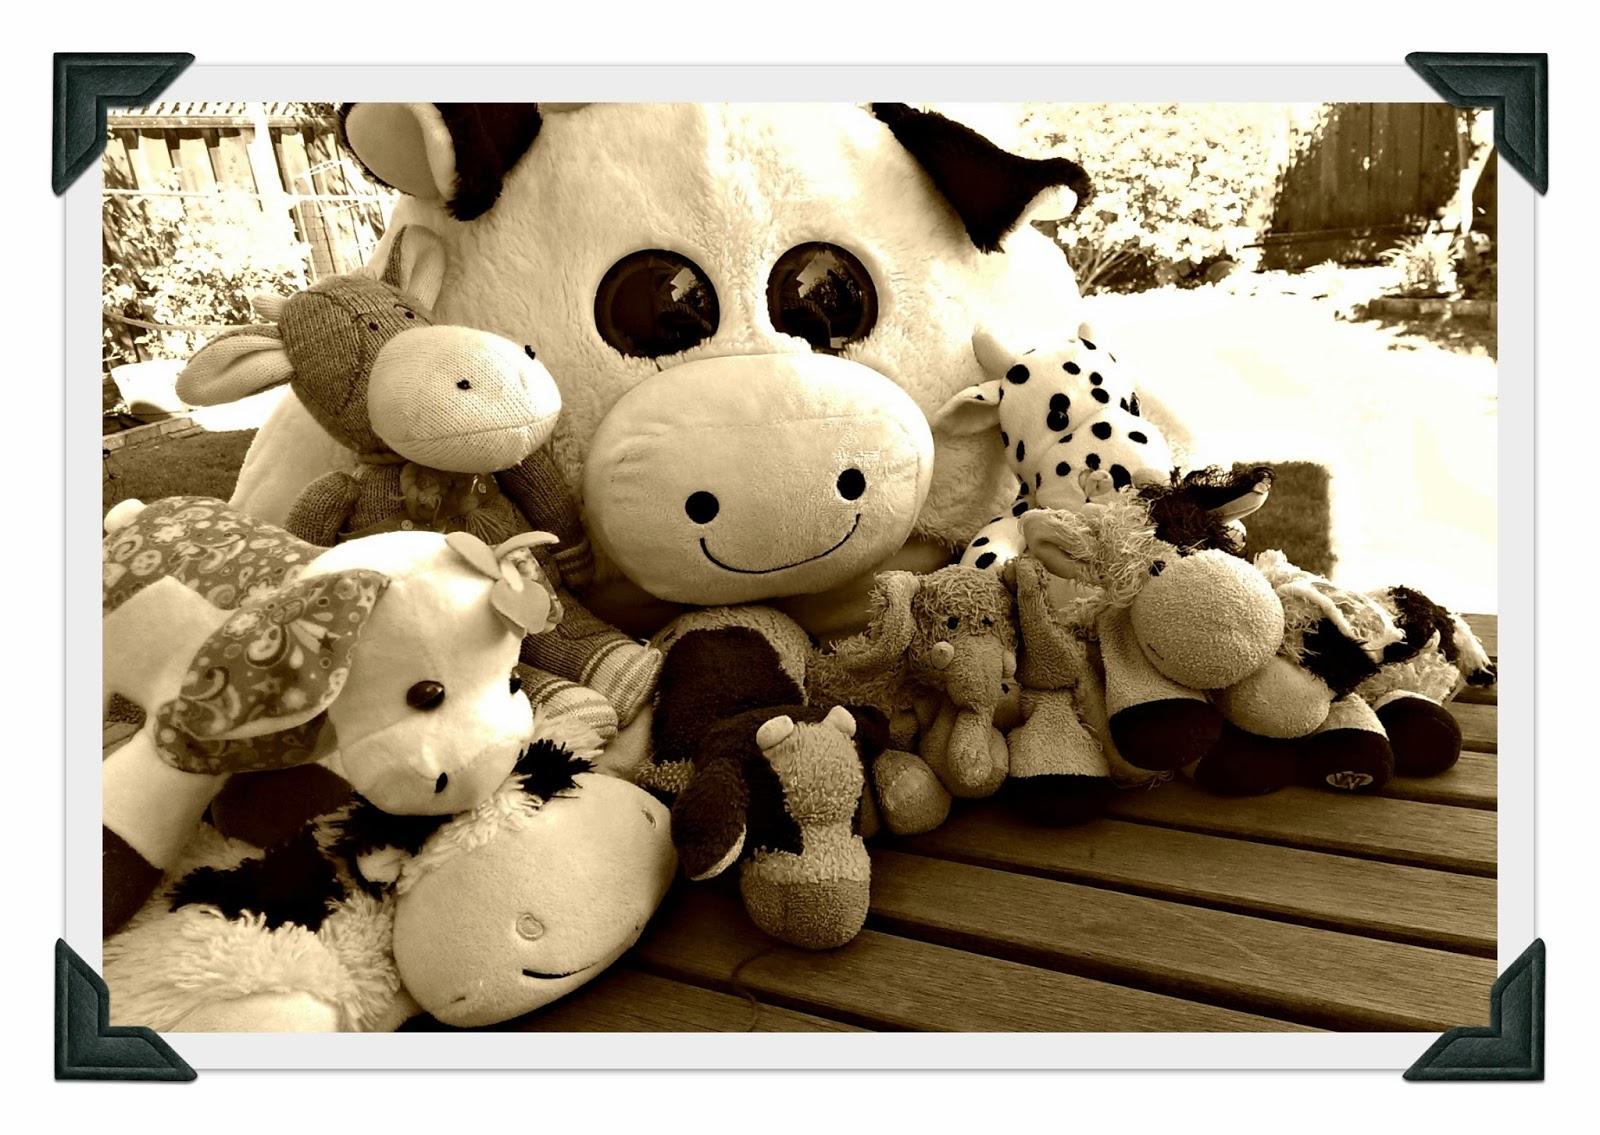 sepia Webkinz stuffed cows